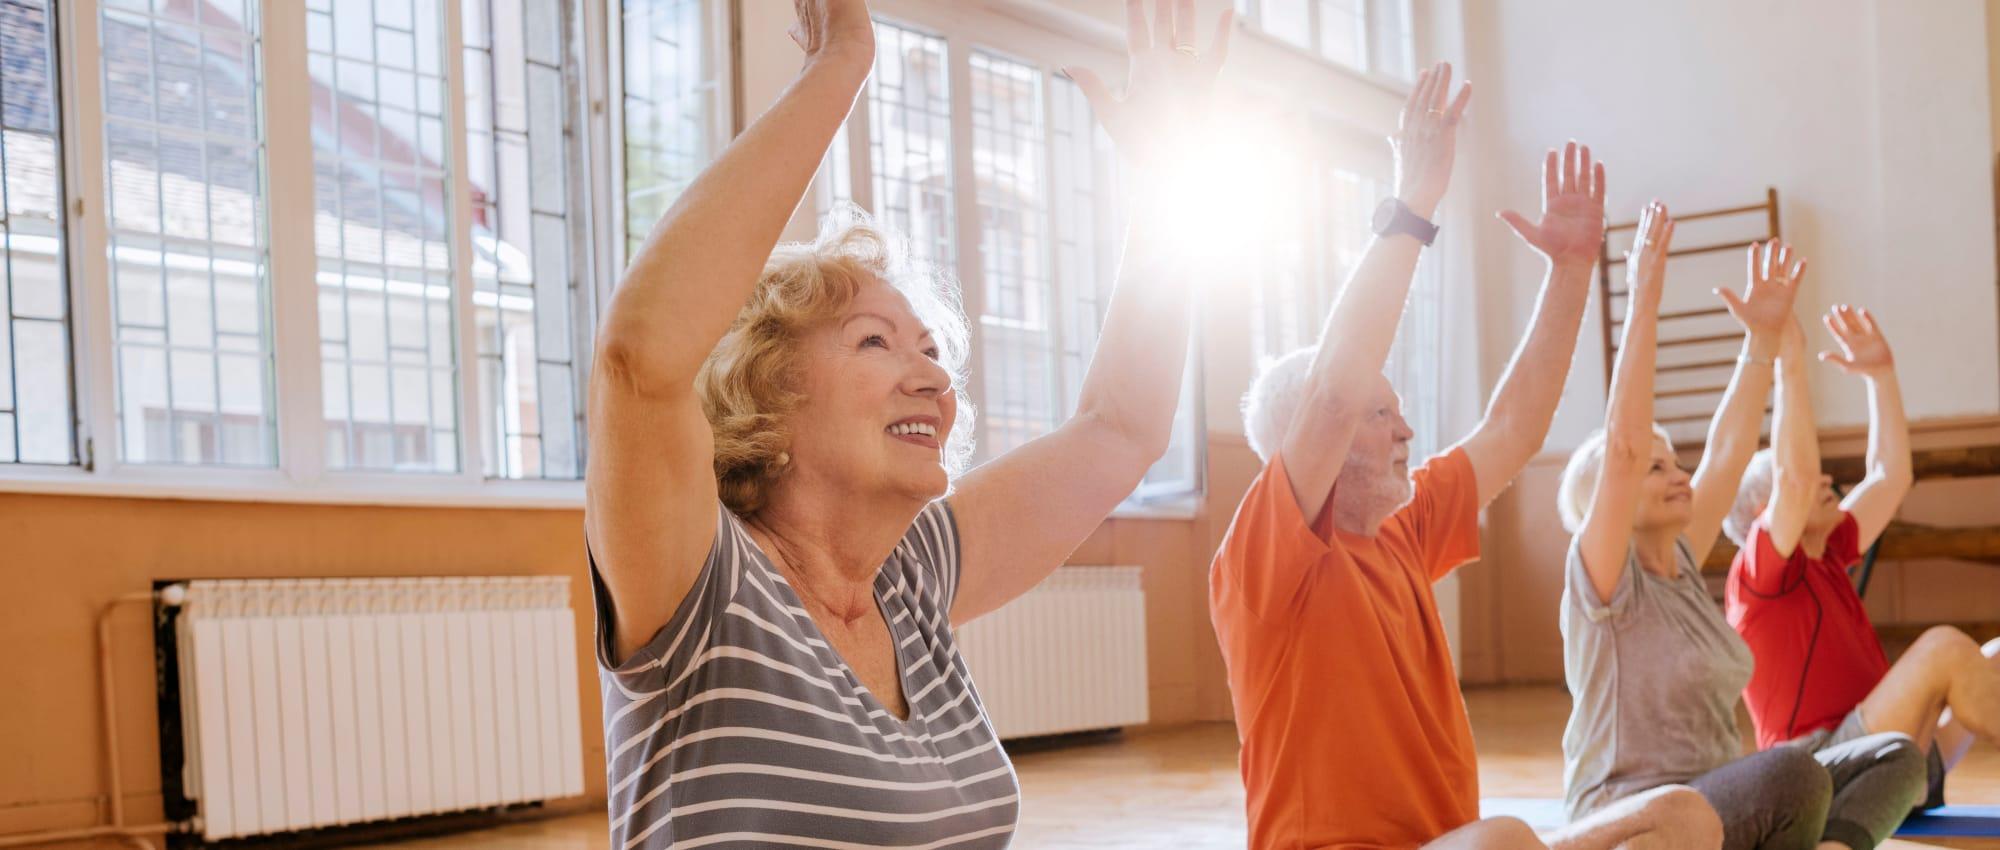 Our programs at Milestone Senior Living in Stoughton, Wisconsin.